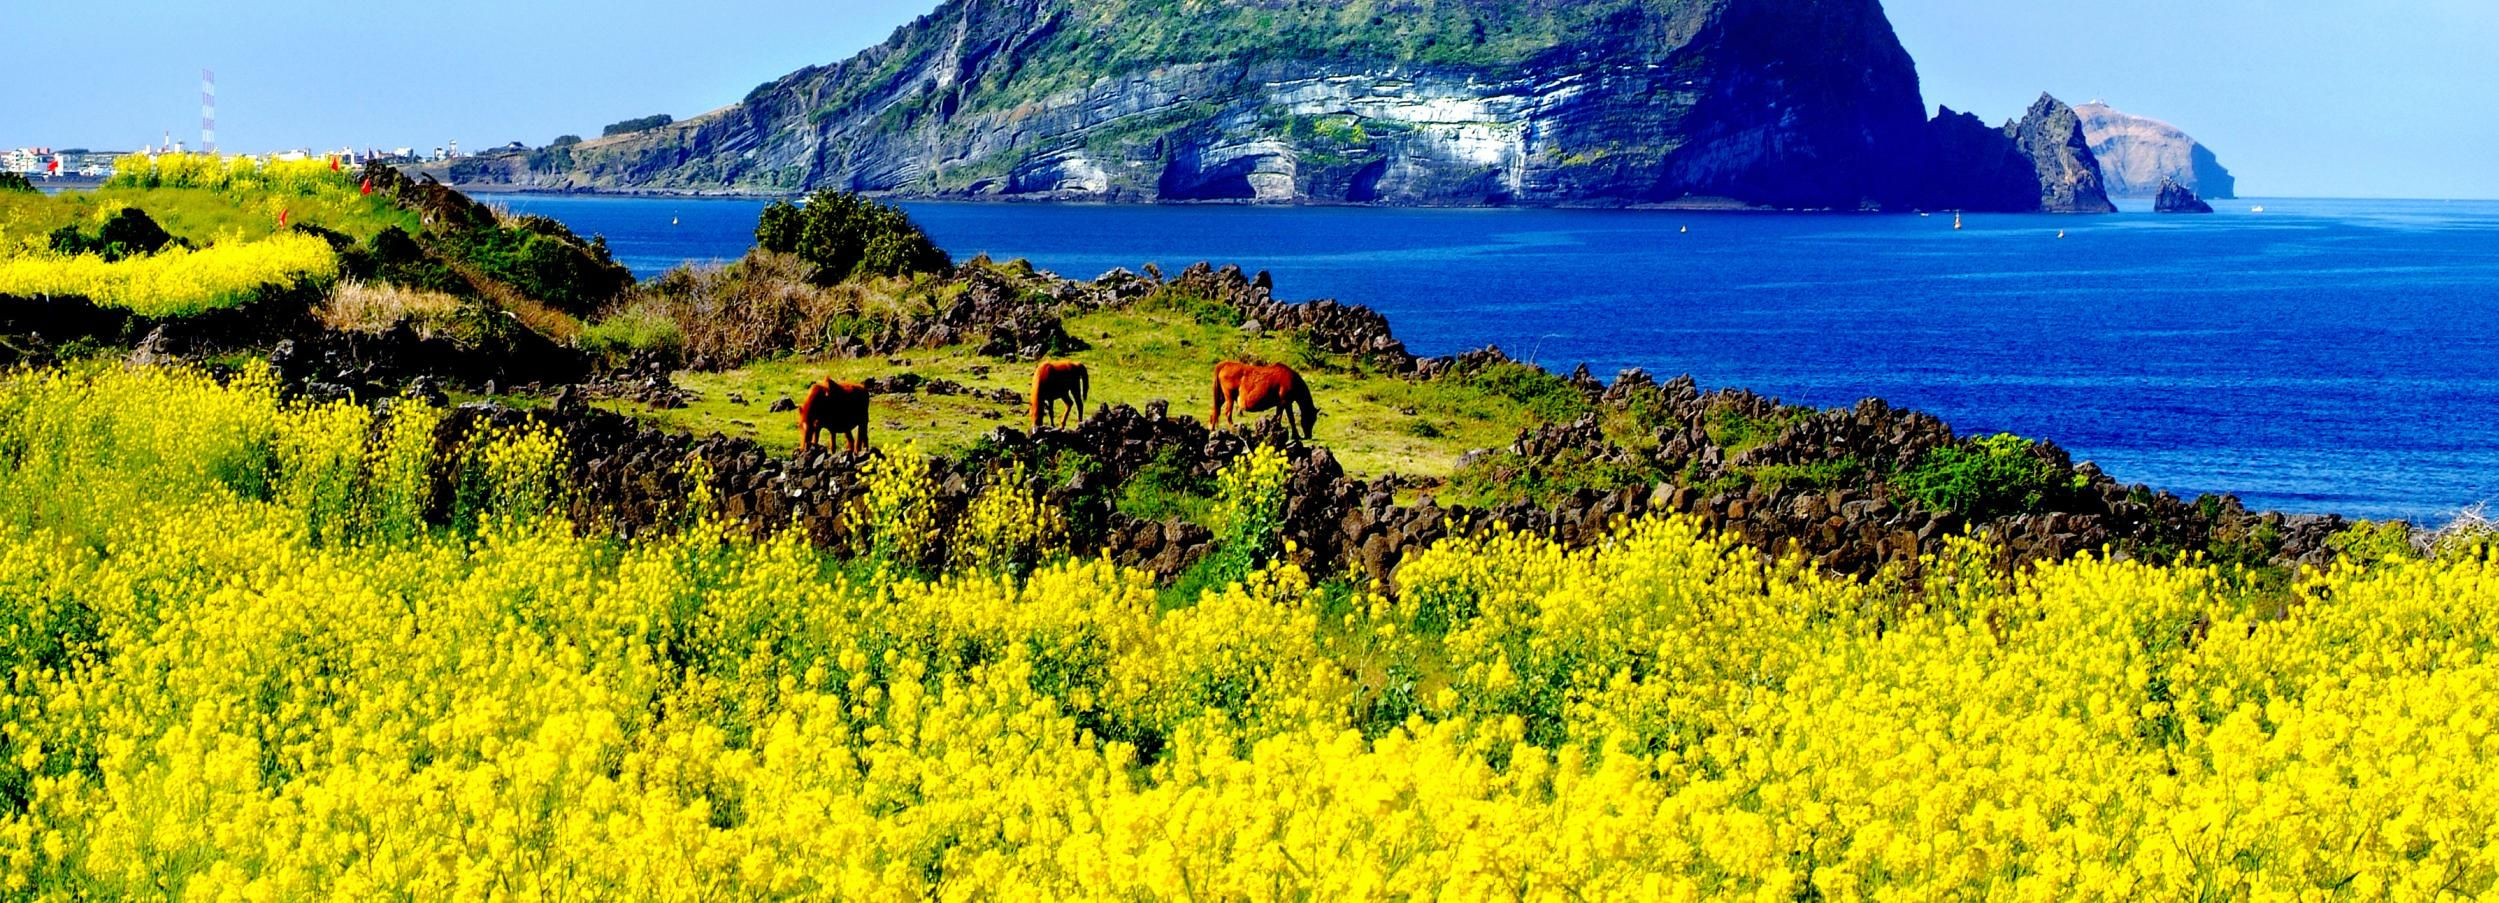 Jeju Island: Customized Private Full-Day Van Tour